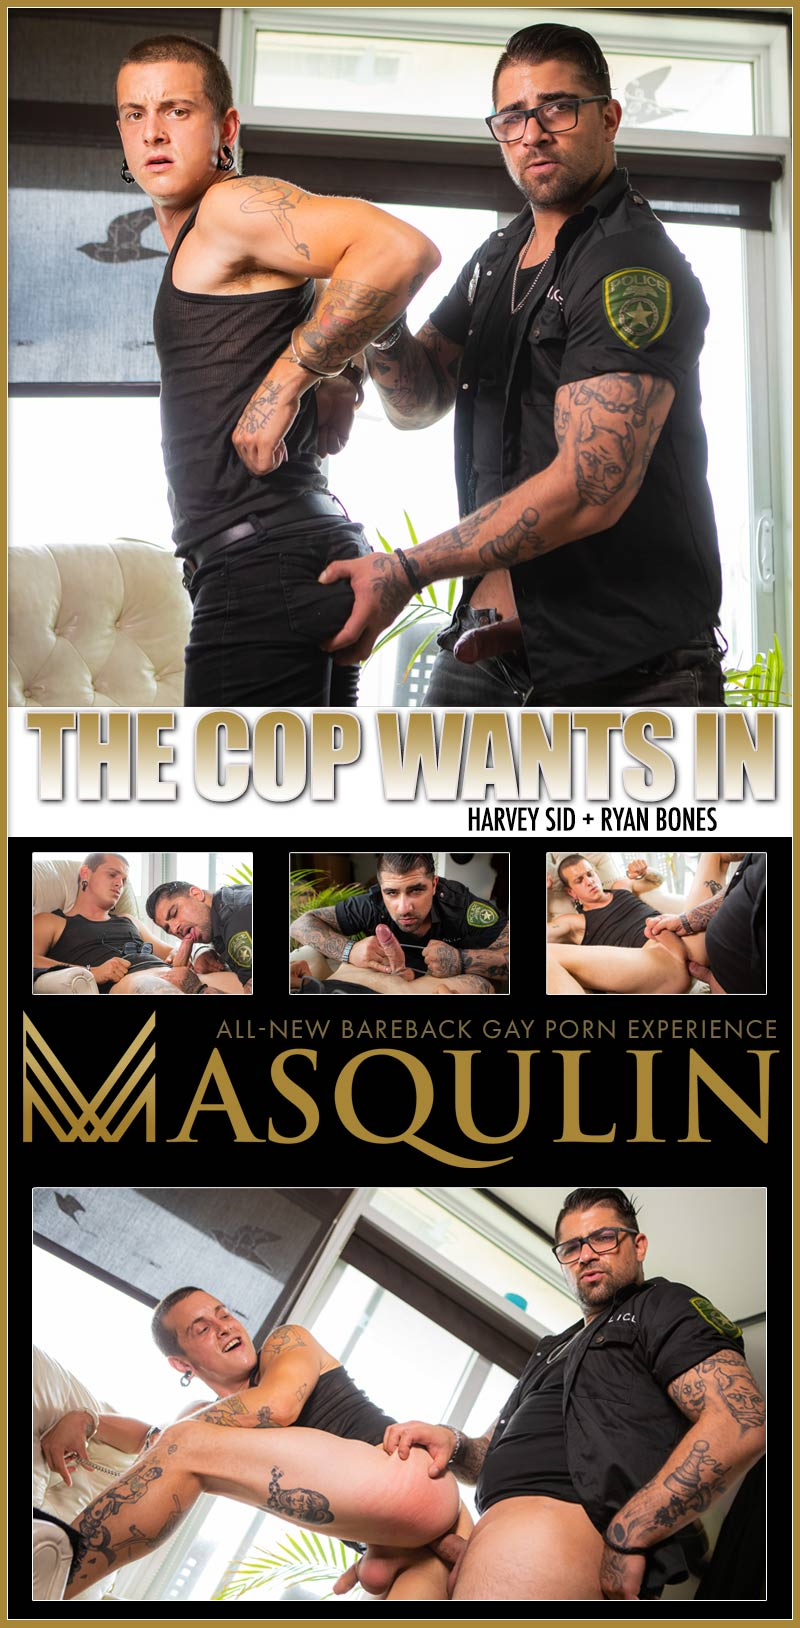 The Cop Wants In, Part 2 (Ryan Bones Fucks Harvey Sid) on Masqulin